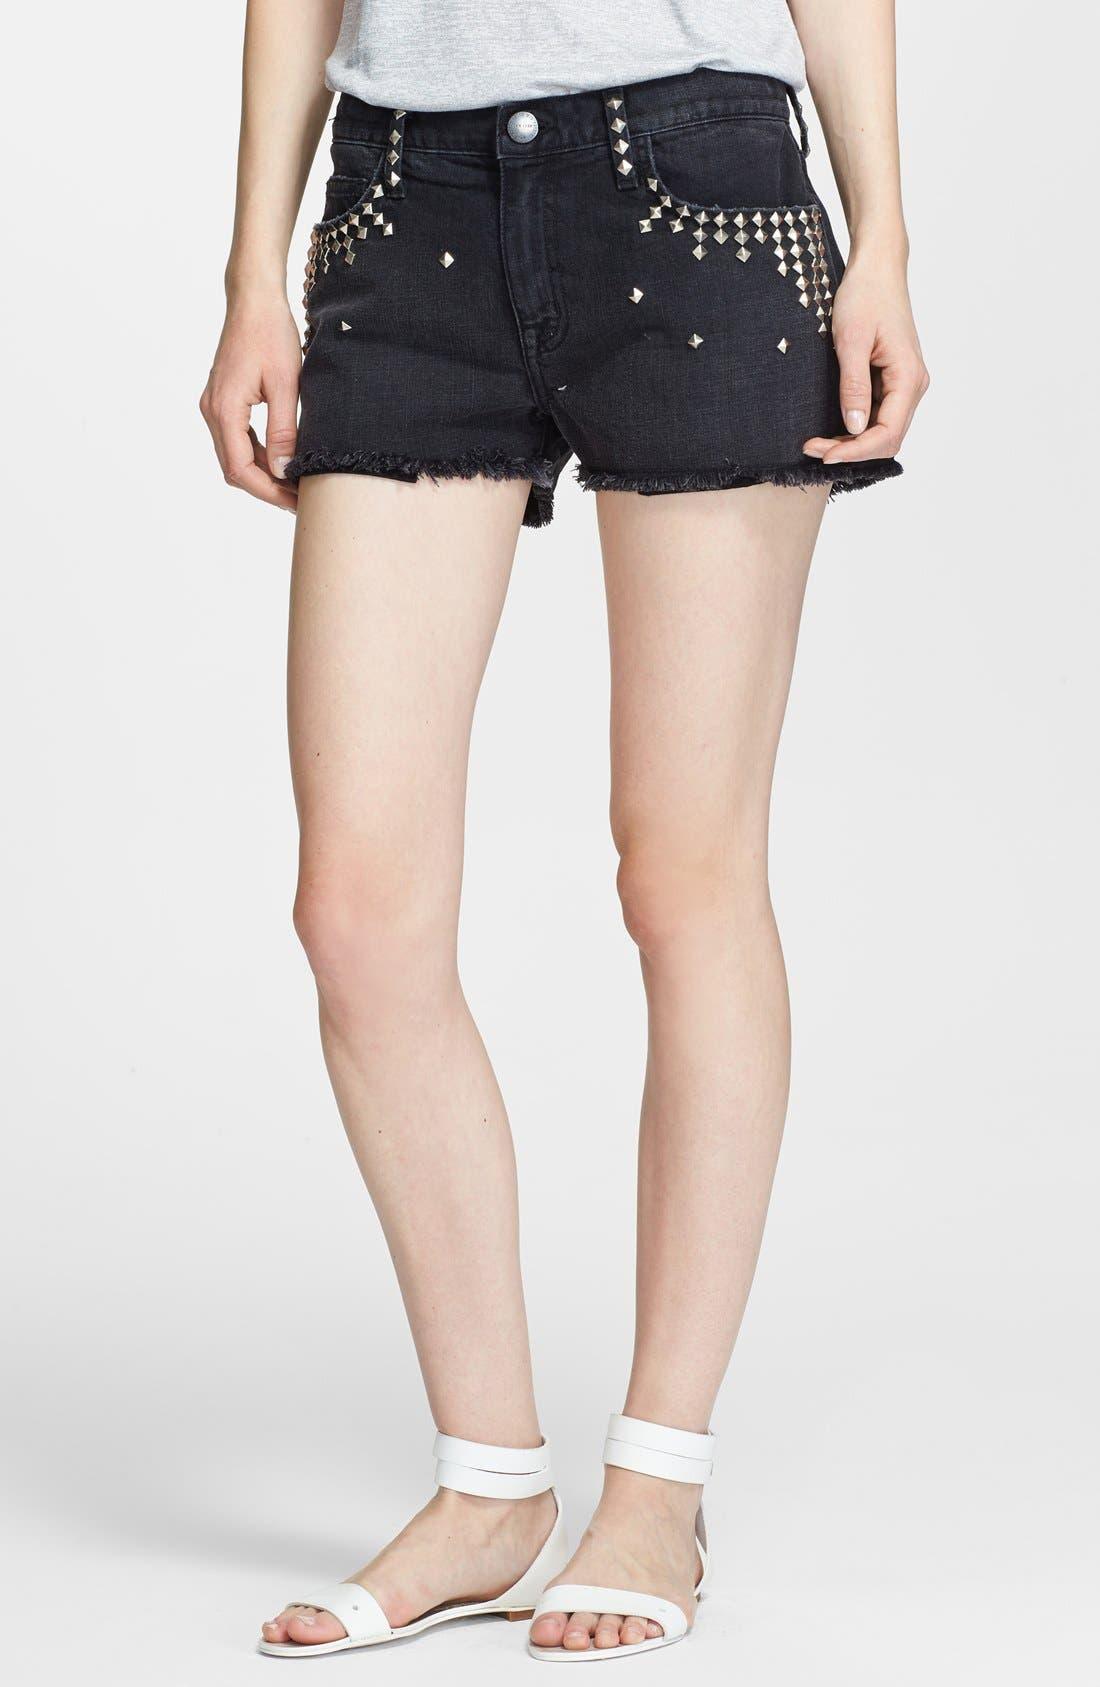 Main Image - Current/Elliott 'The Boyfriend' Studded Shorts